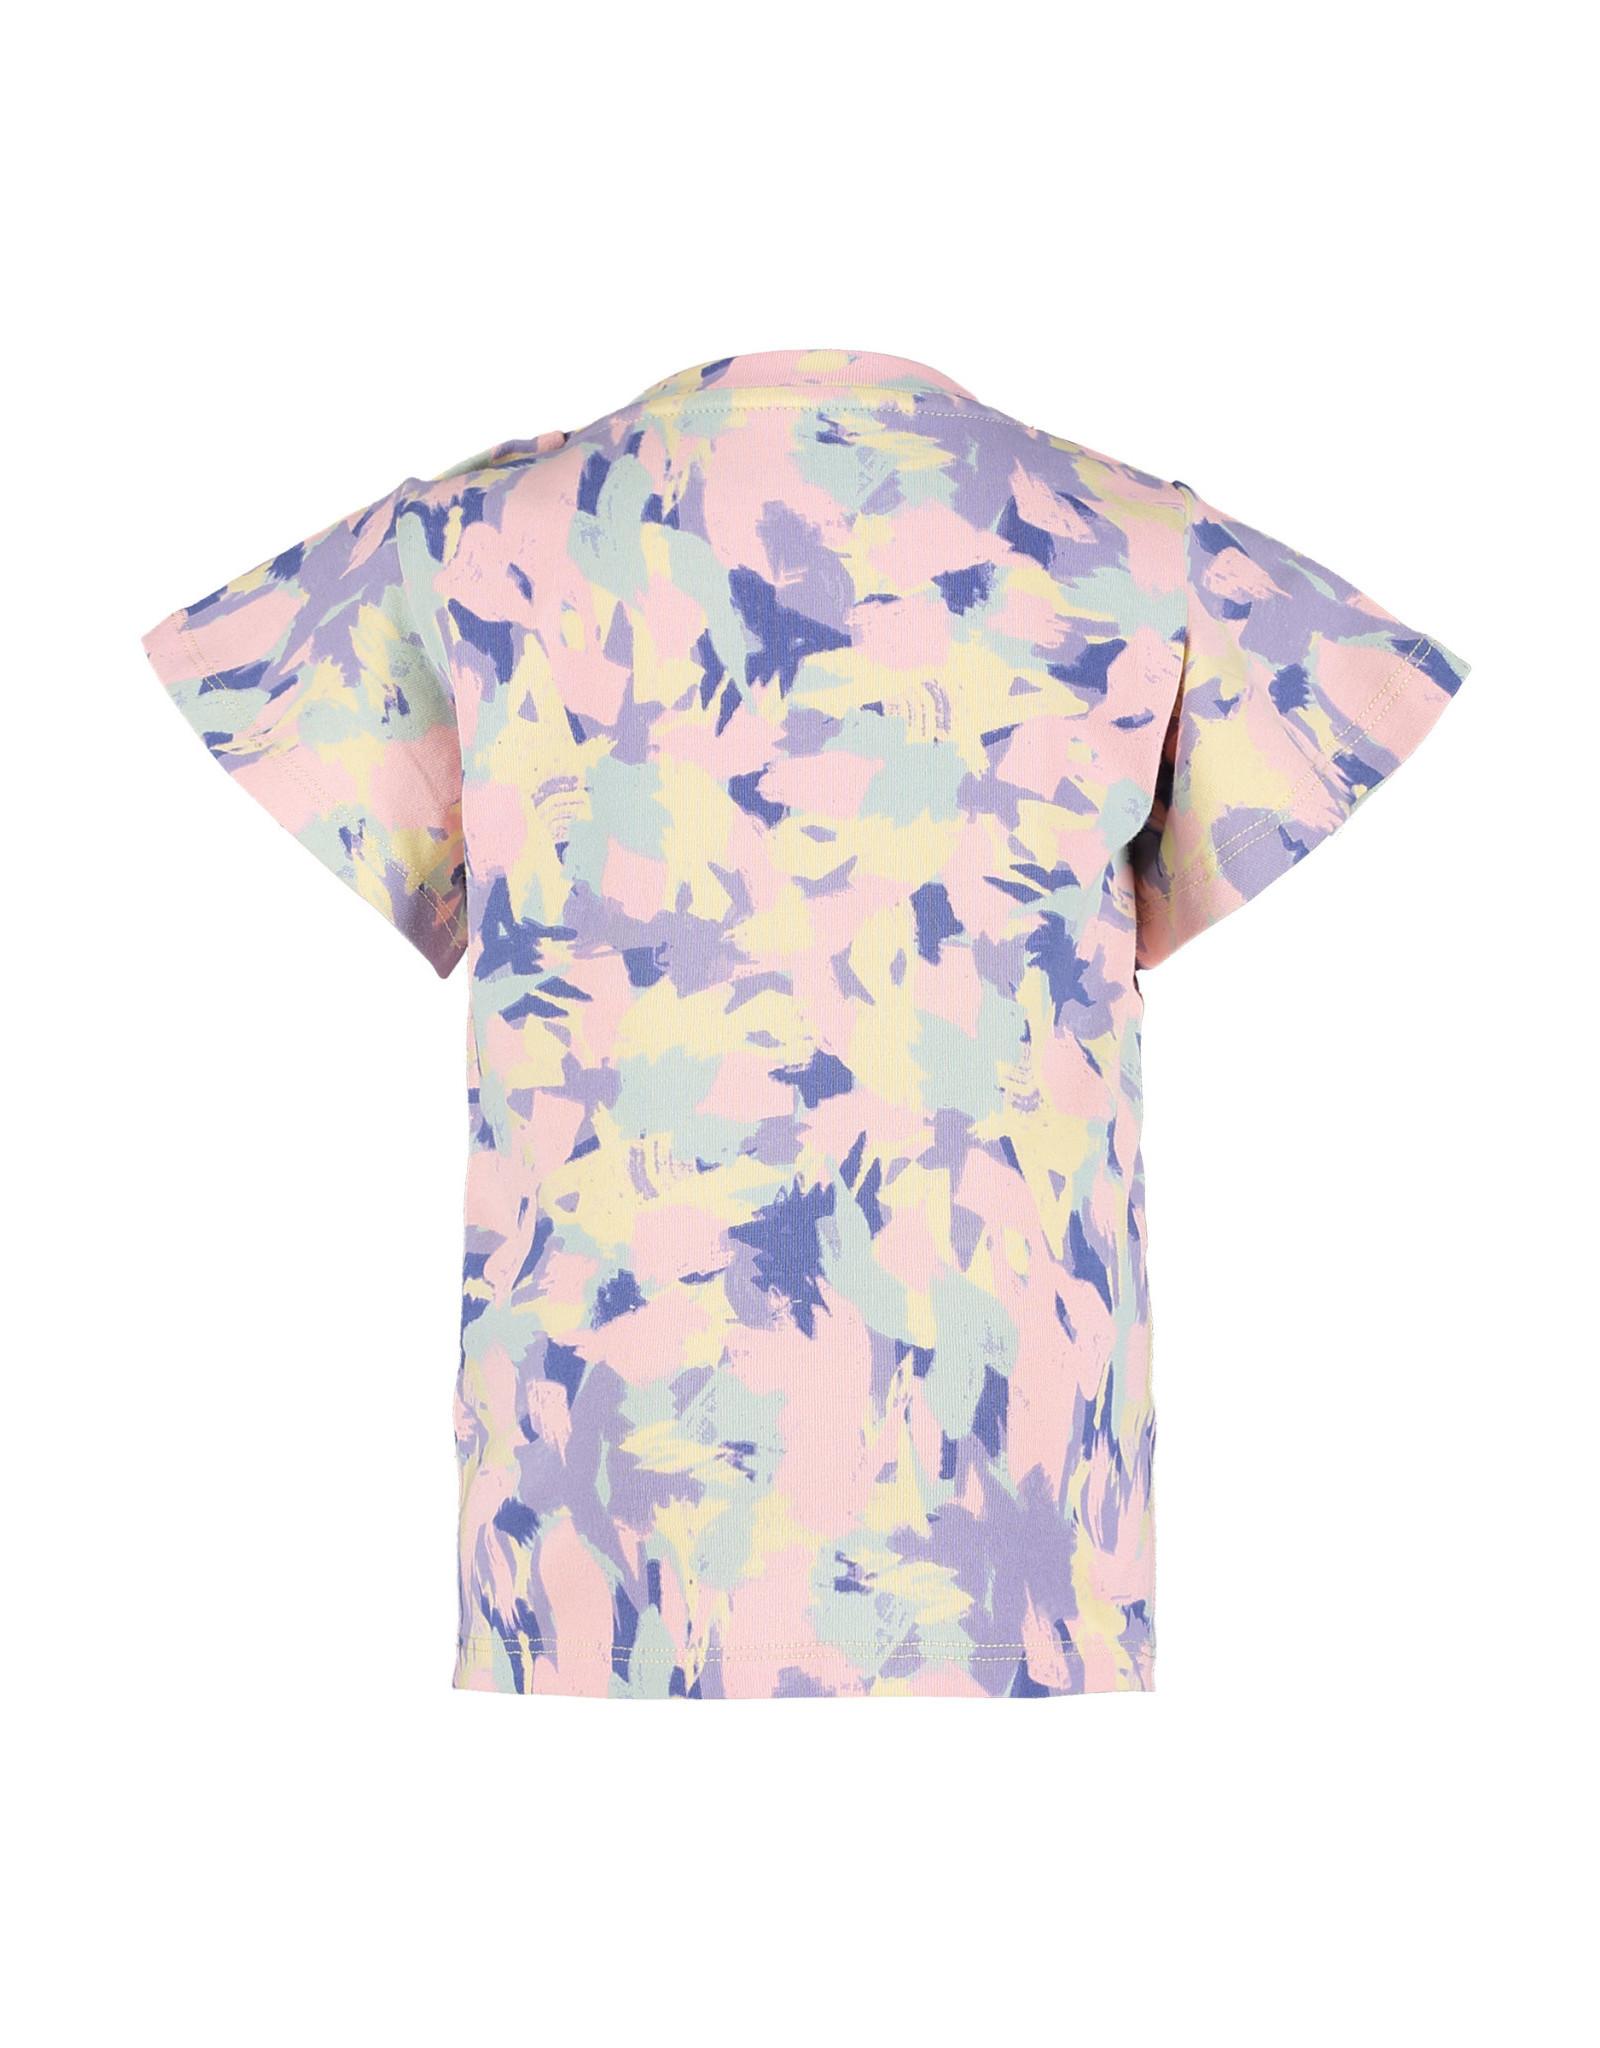 4President 4President meisjes t-shirt Ilse lilac AOP